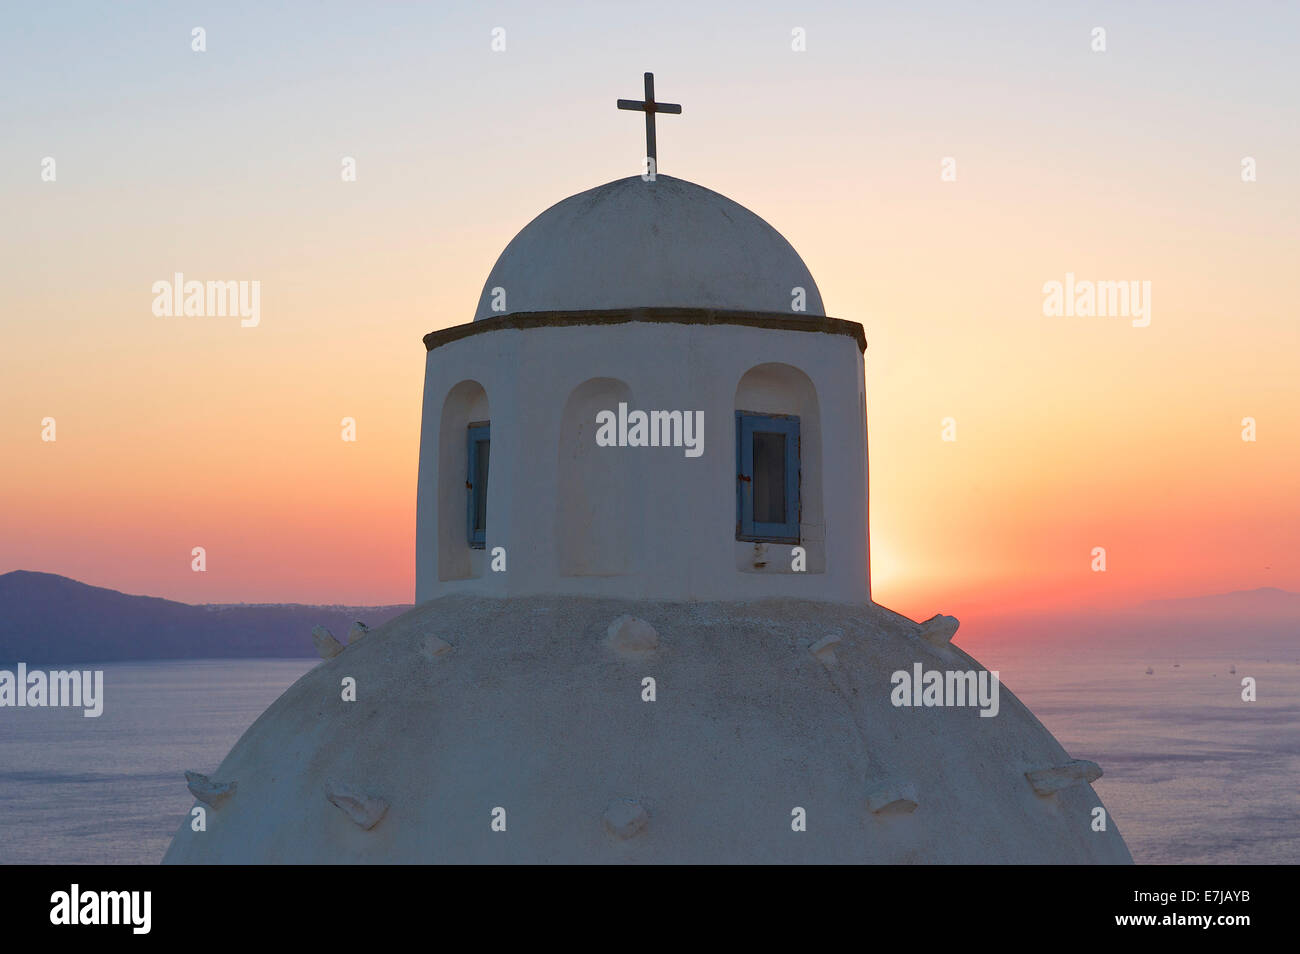 Domo de la Iglesia al atardecer, Thira, Santorini, Cícladas, Grecia Imagen De Stock